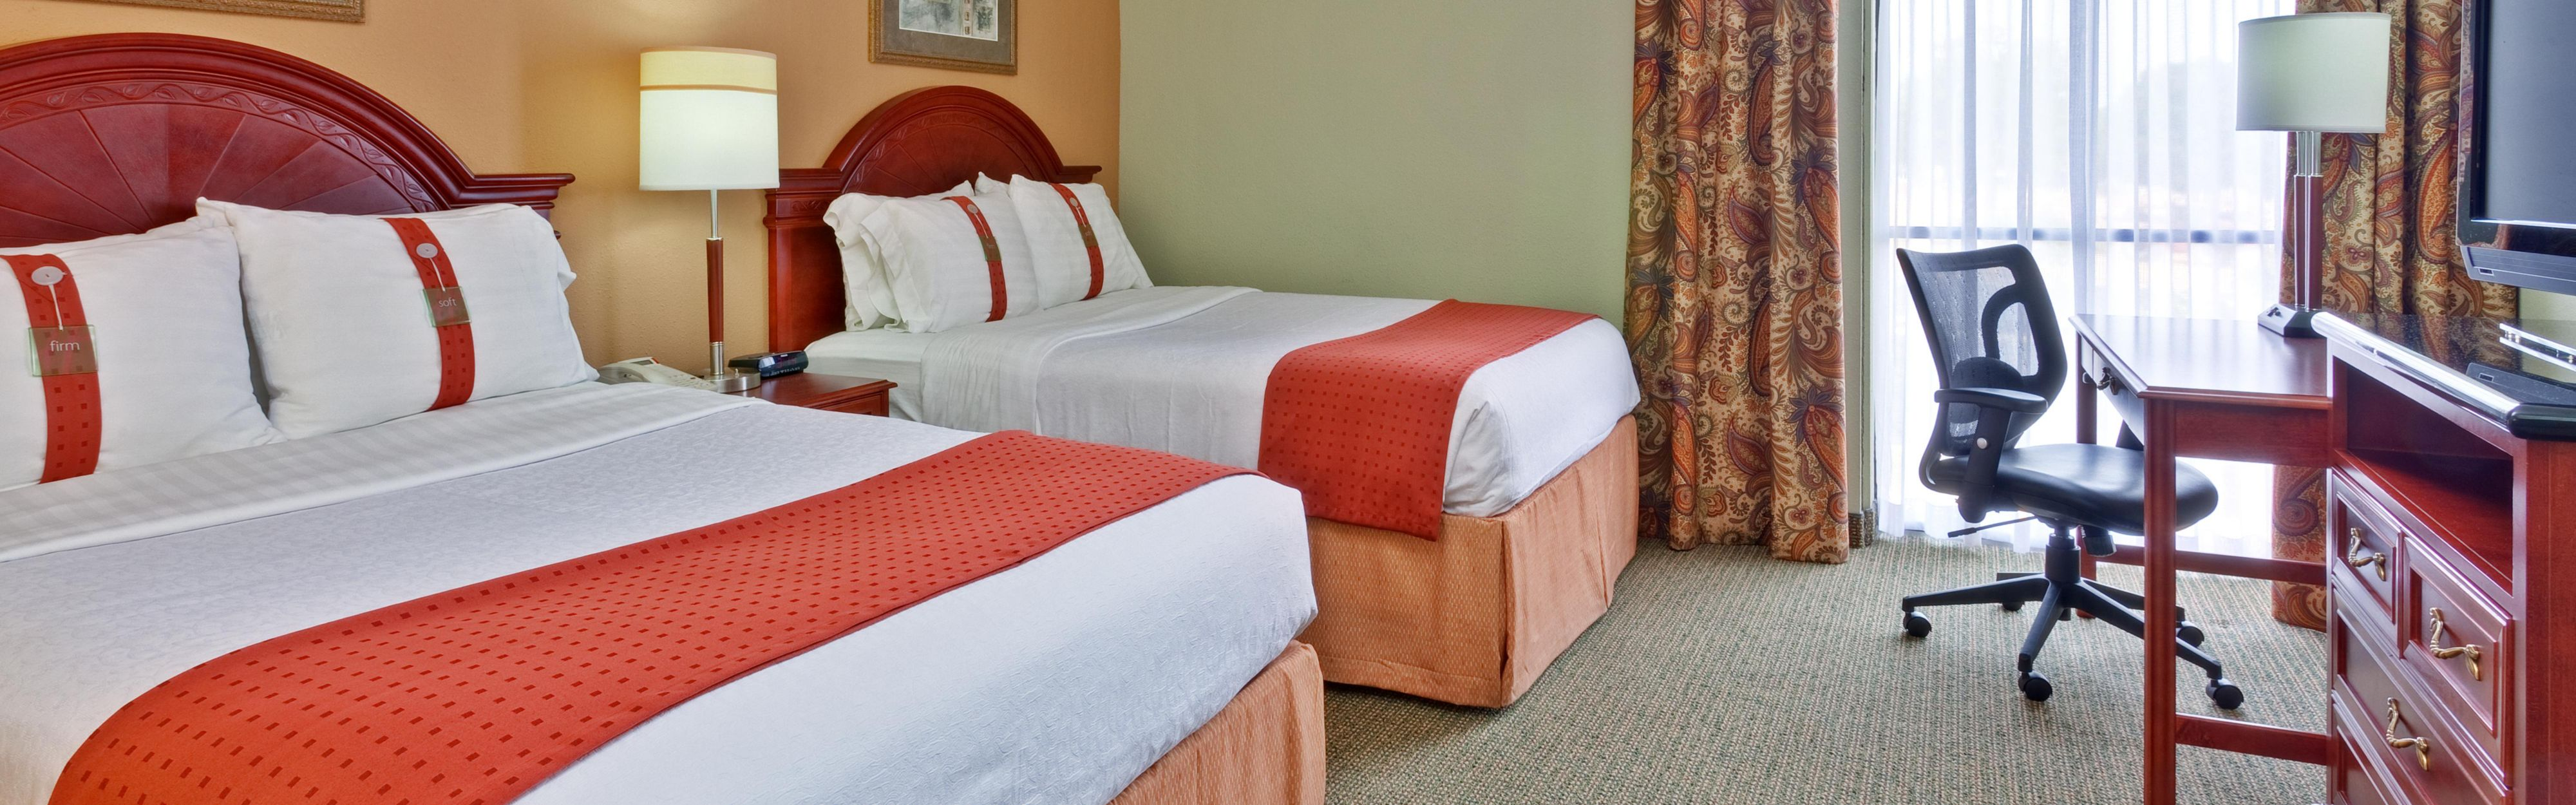 Holiday Inn Memphis-Univ Of Memphis image 1